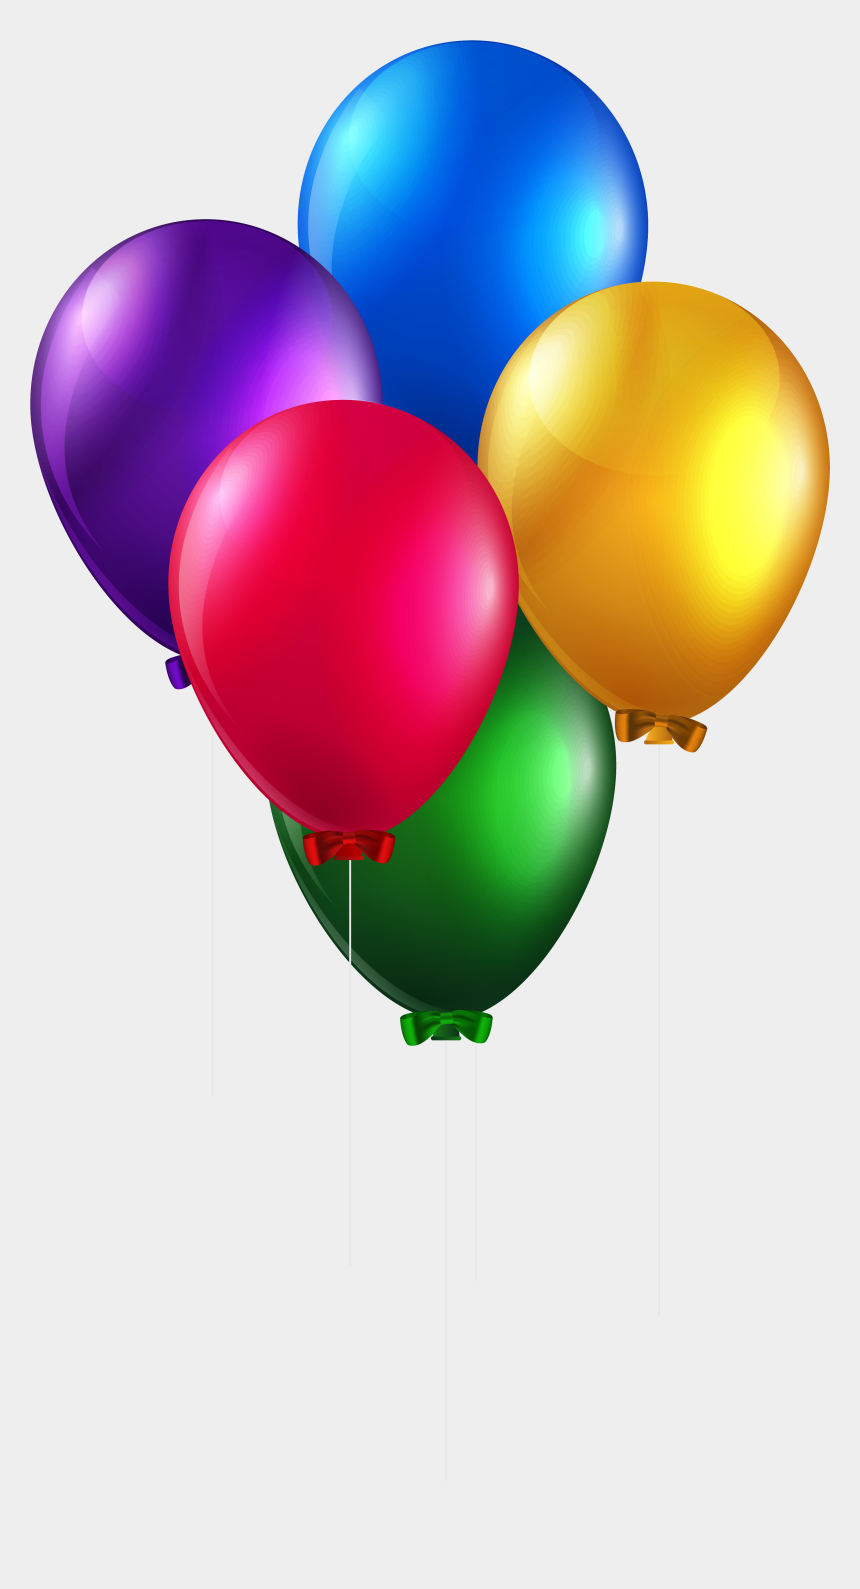 clip art balloons, Cartoons - Balloon Clipart Colorful Balloon - Balloon Image Transparent Background